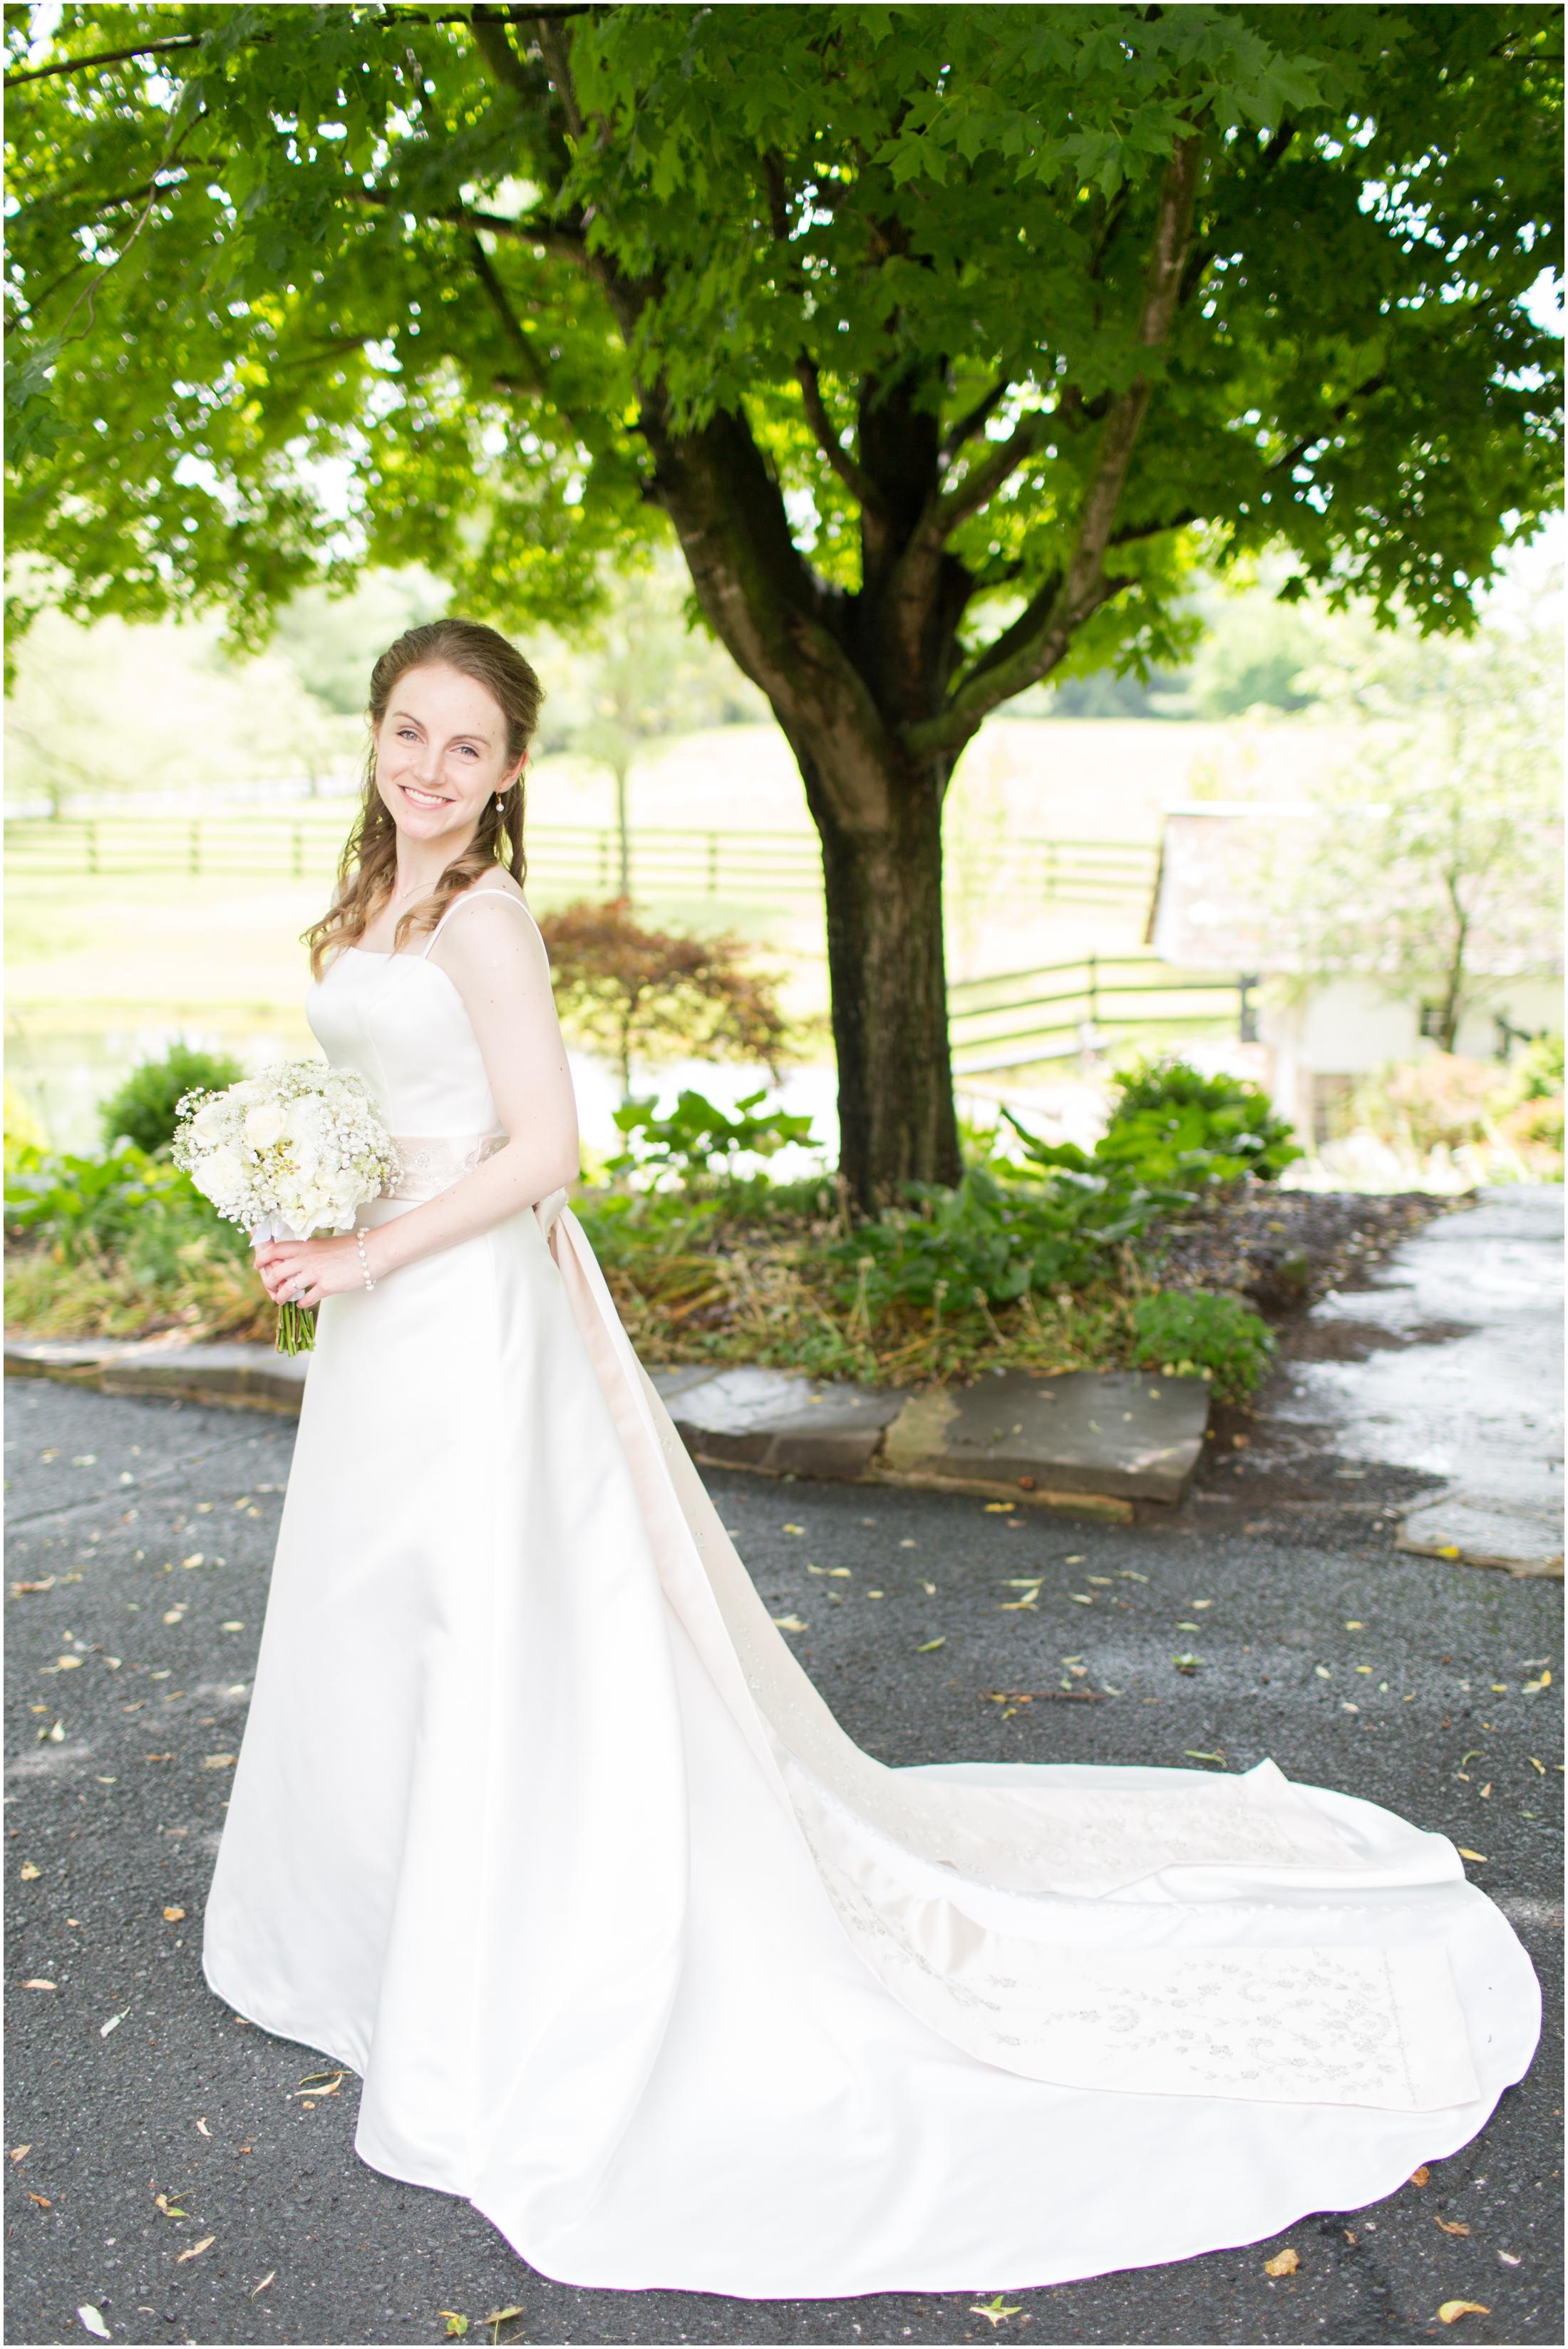 Nash-Wedding-Bride-and-Groom-Portraits-454.jpg